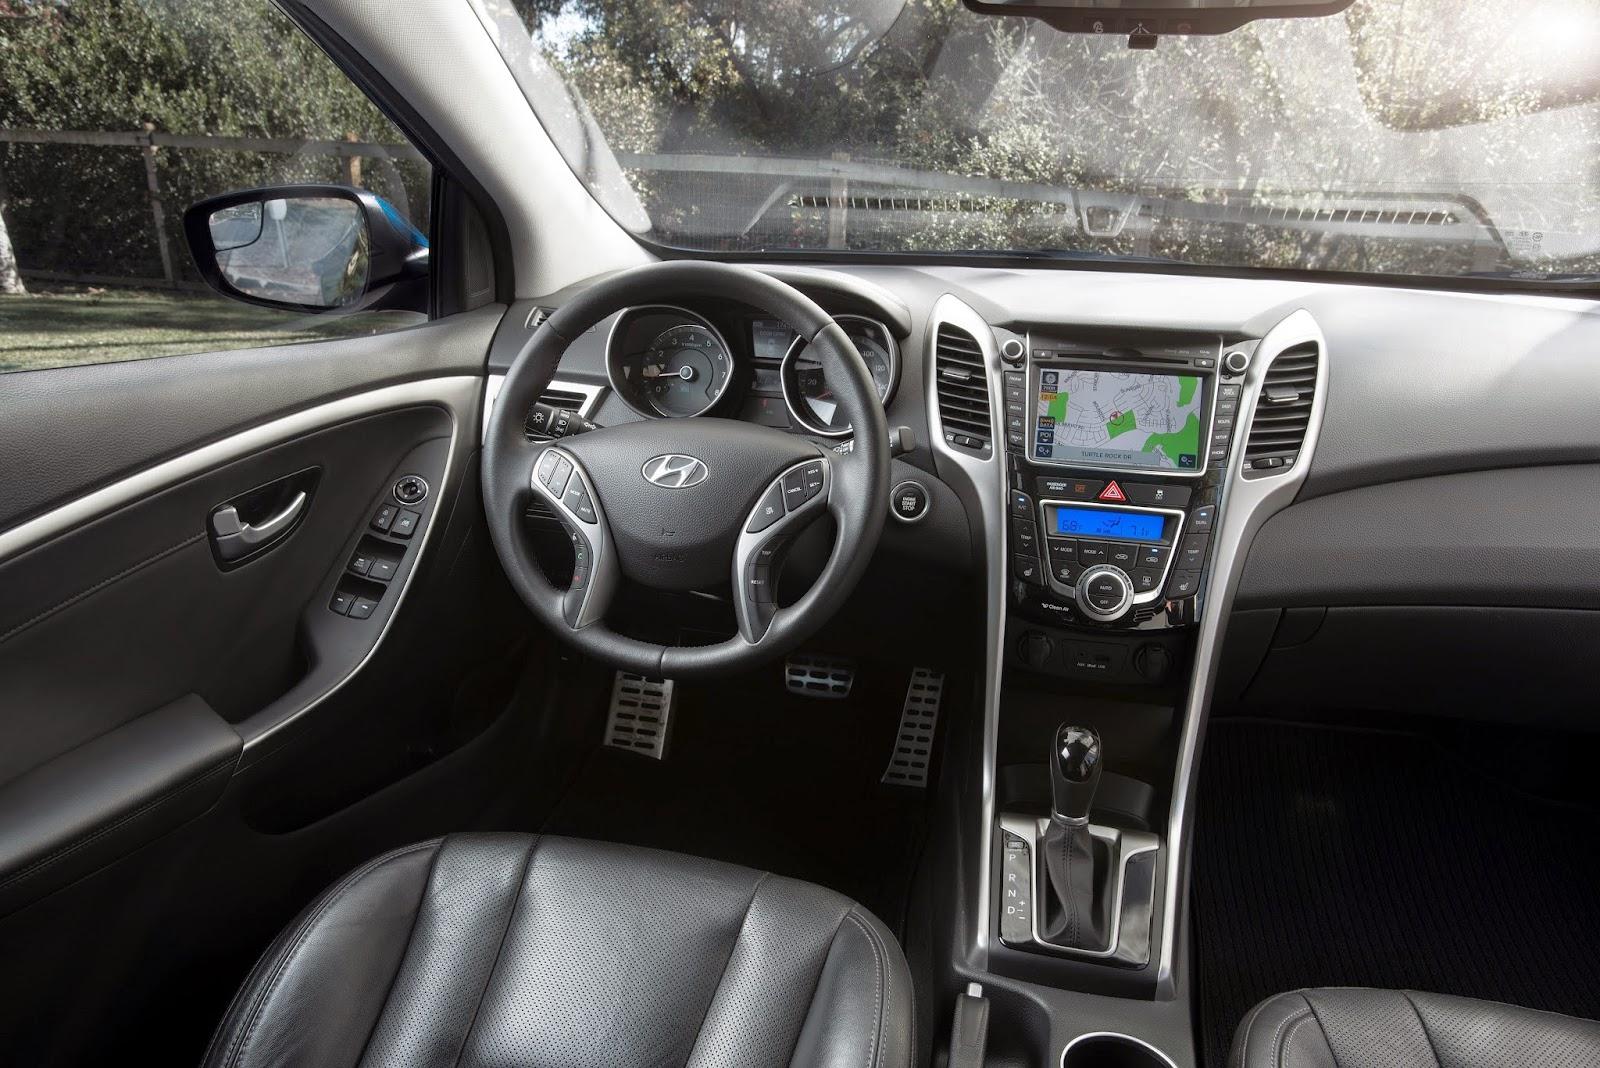 Interior view of 2014 Hyundai Elantra GT